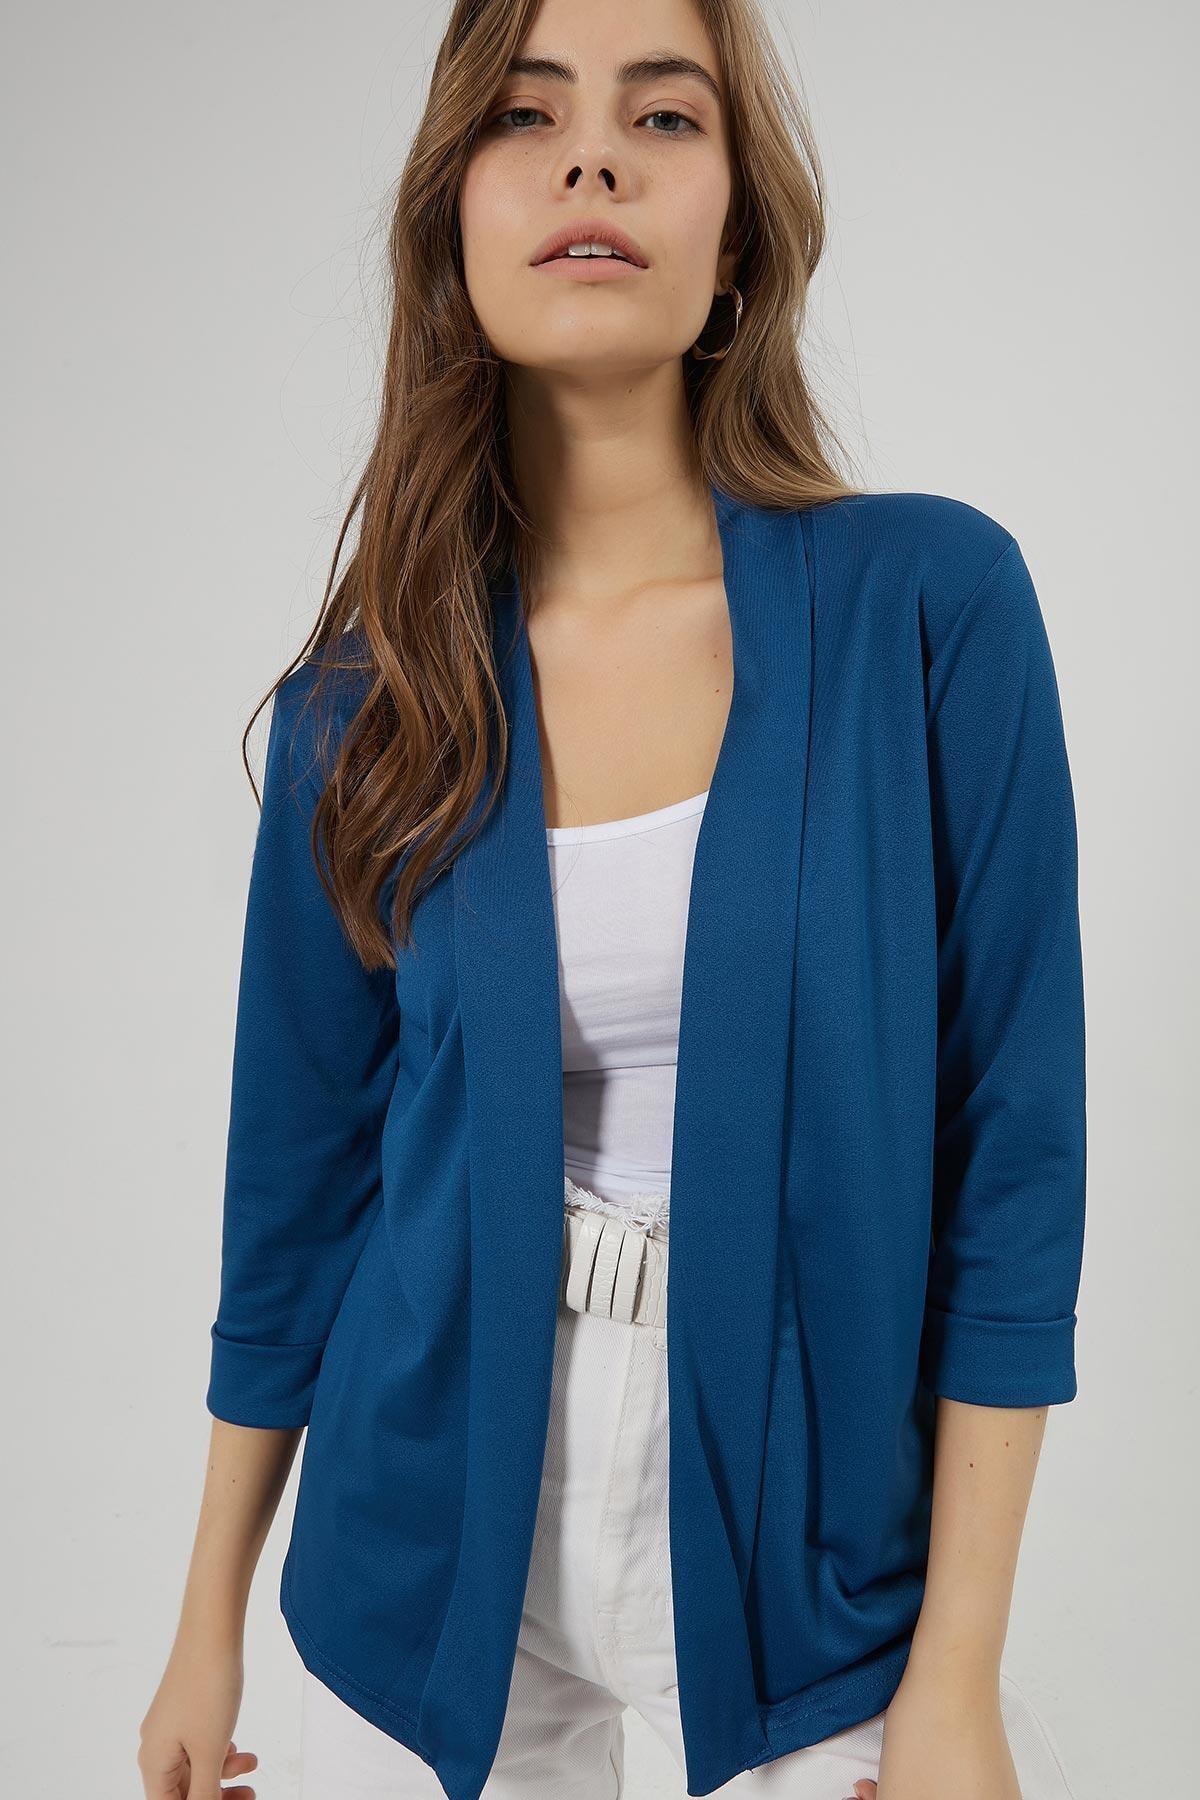 Y-London Kadın Lacivert Şal Yaka Blazer Ceket Y20W169-1185 1